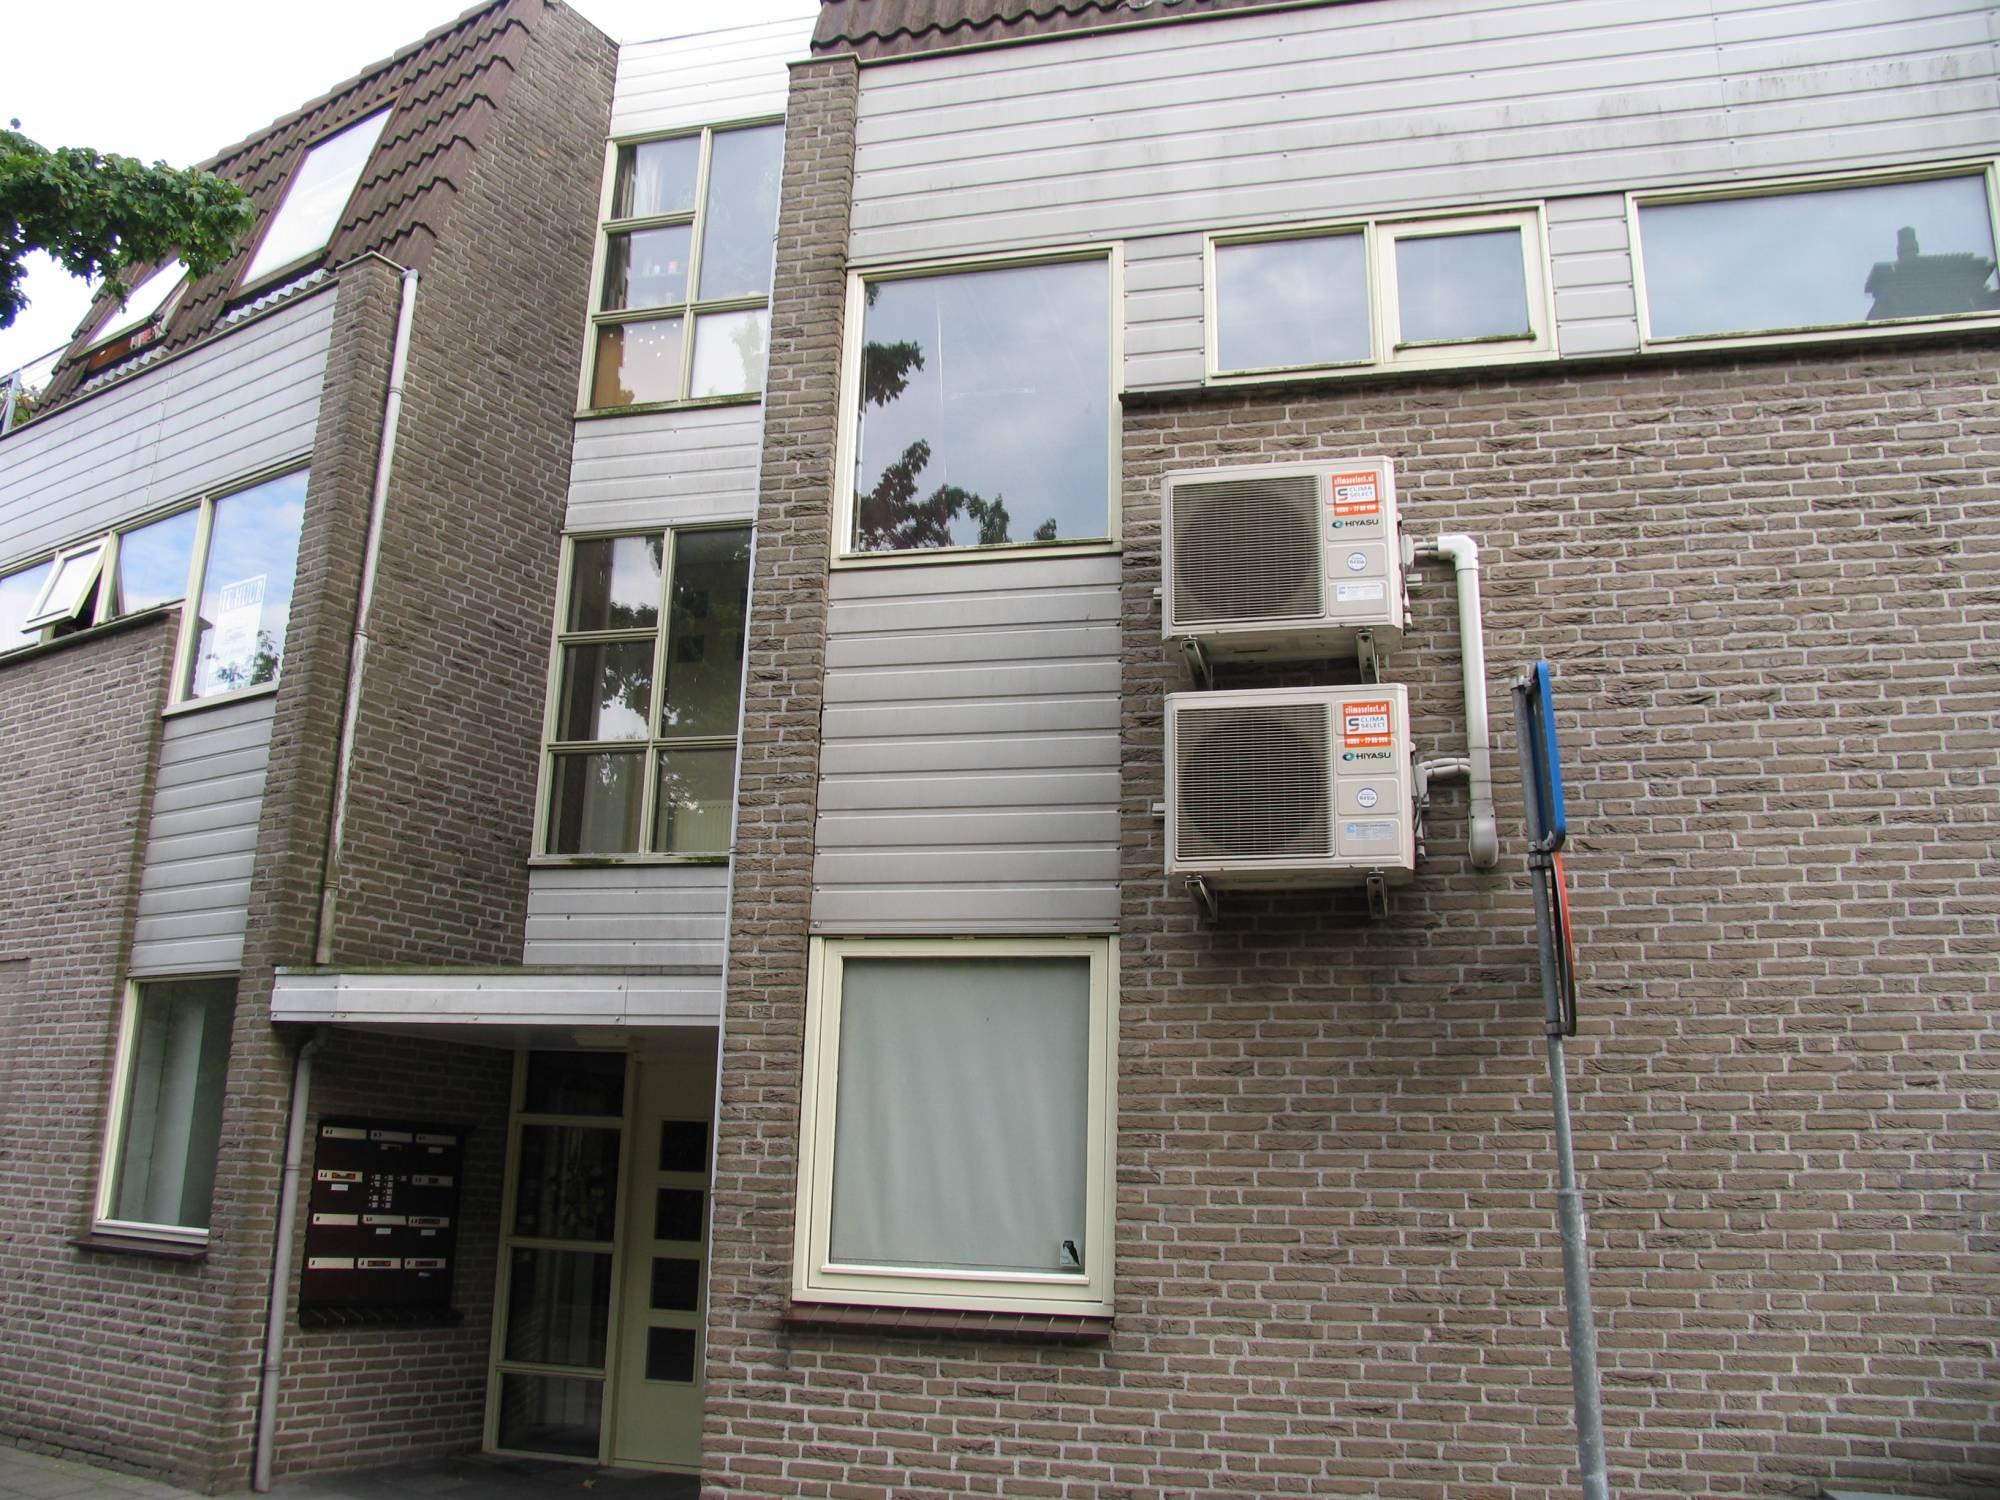 https://public.parariusoffice.nl/170/photos/huge/2850888.1431095702-88.jpg